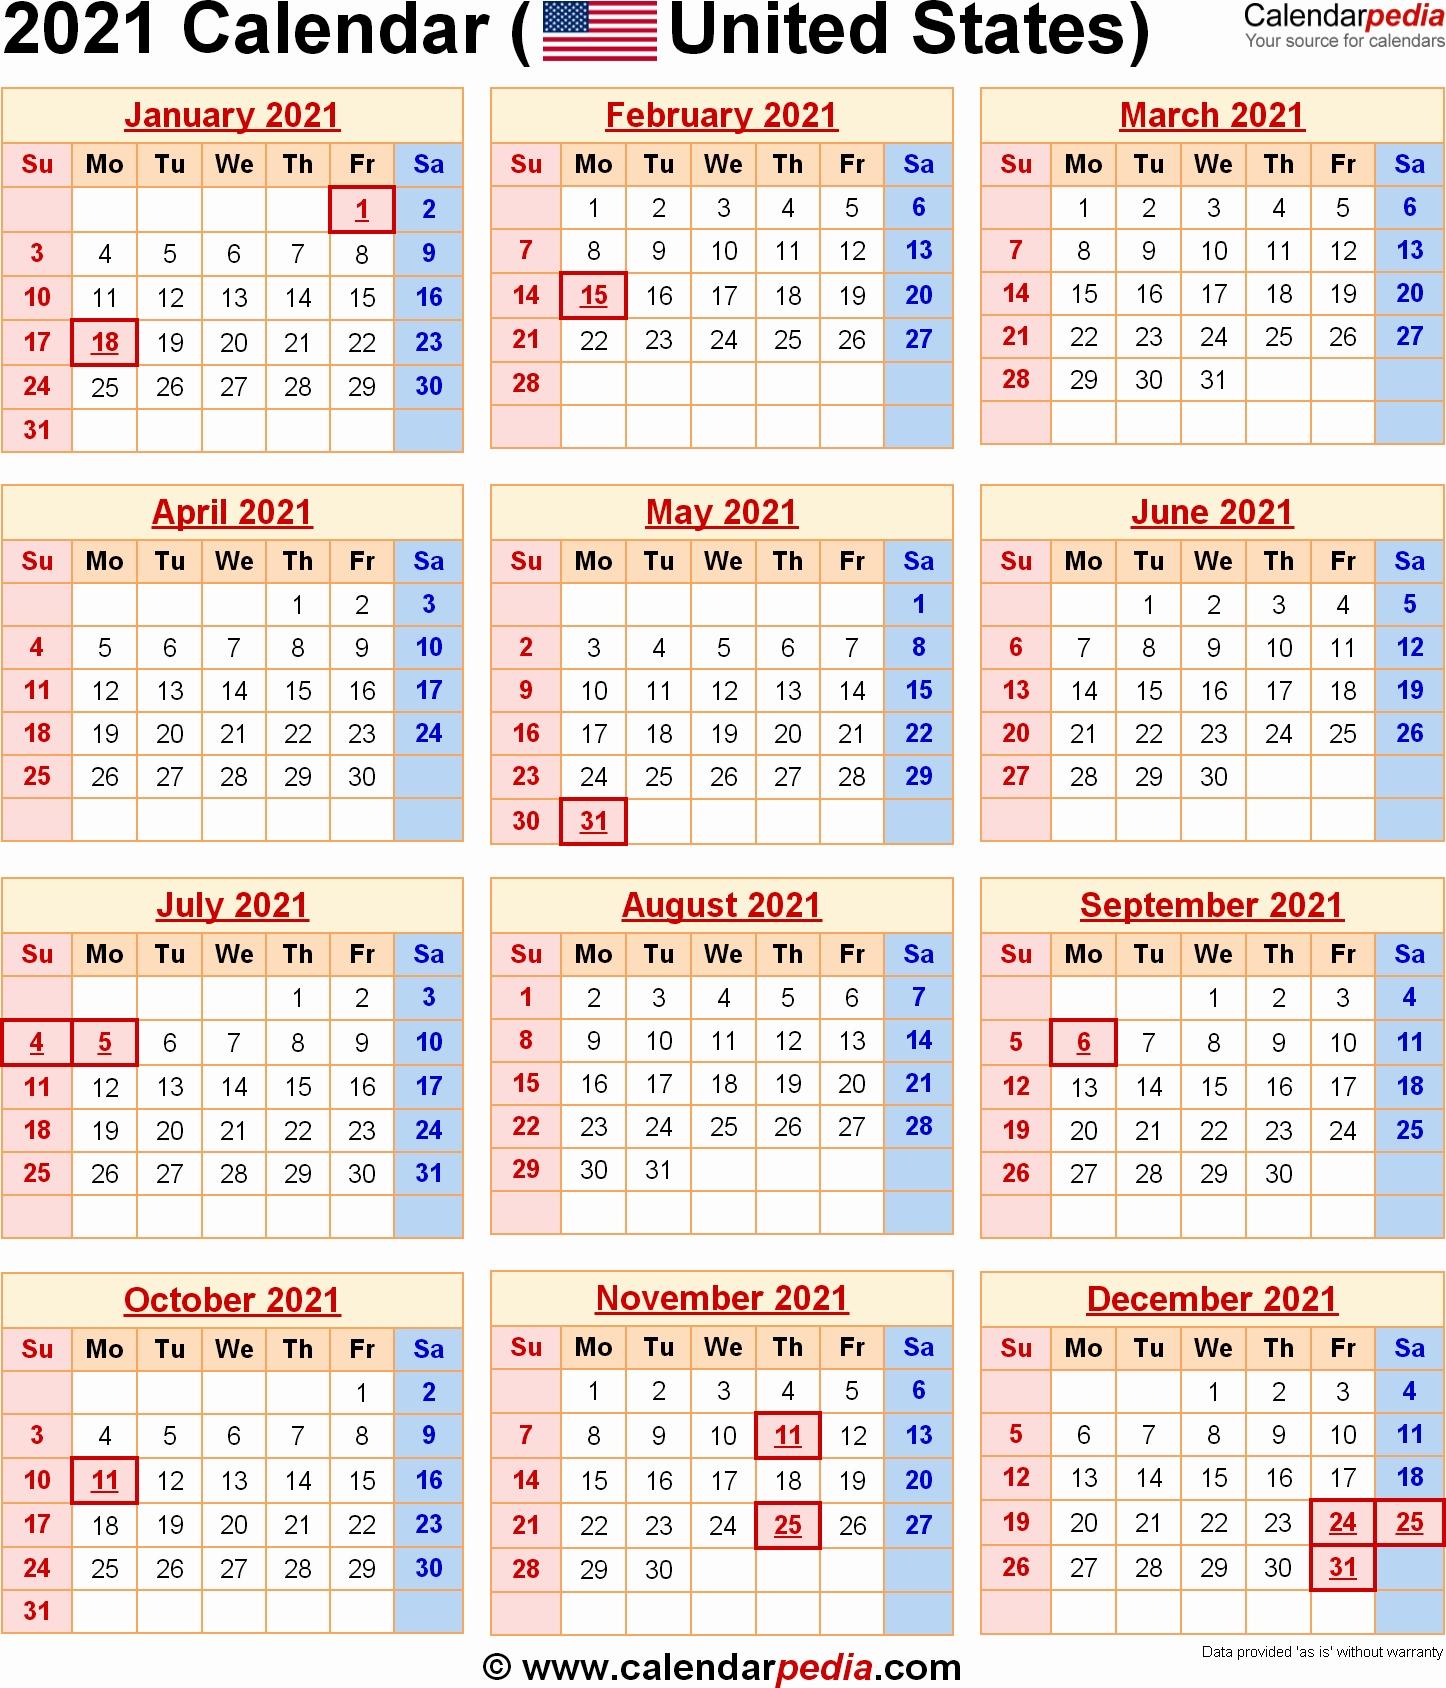 Exceptional 2020 Calendar Federal Holidays • Printable Blank